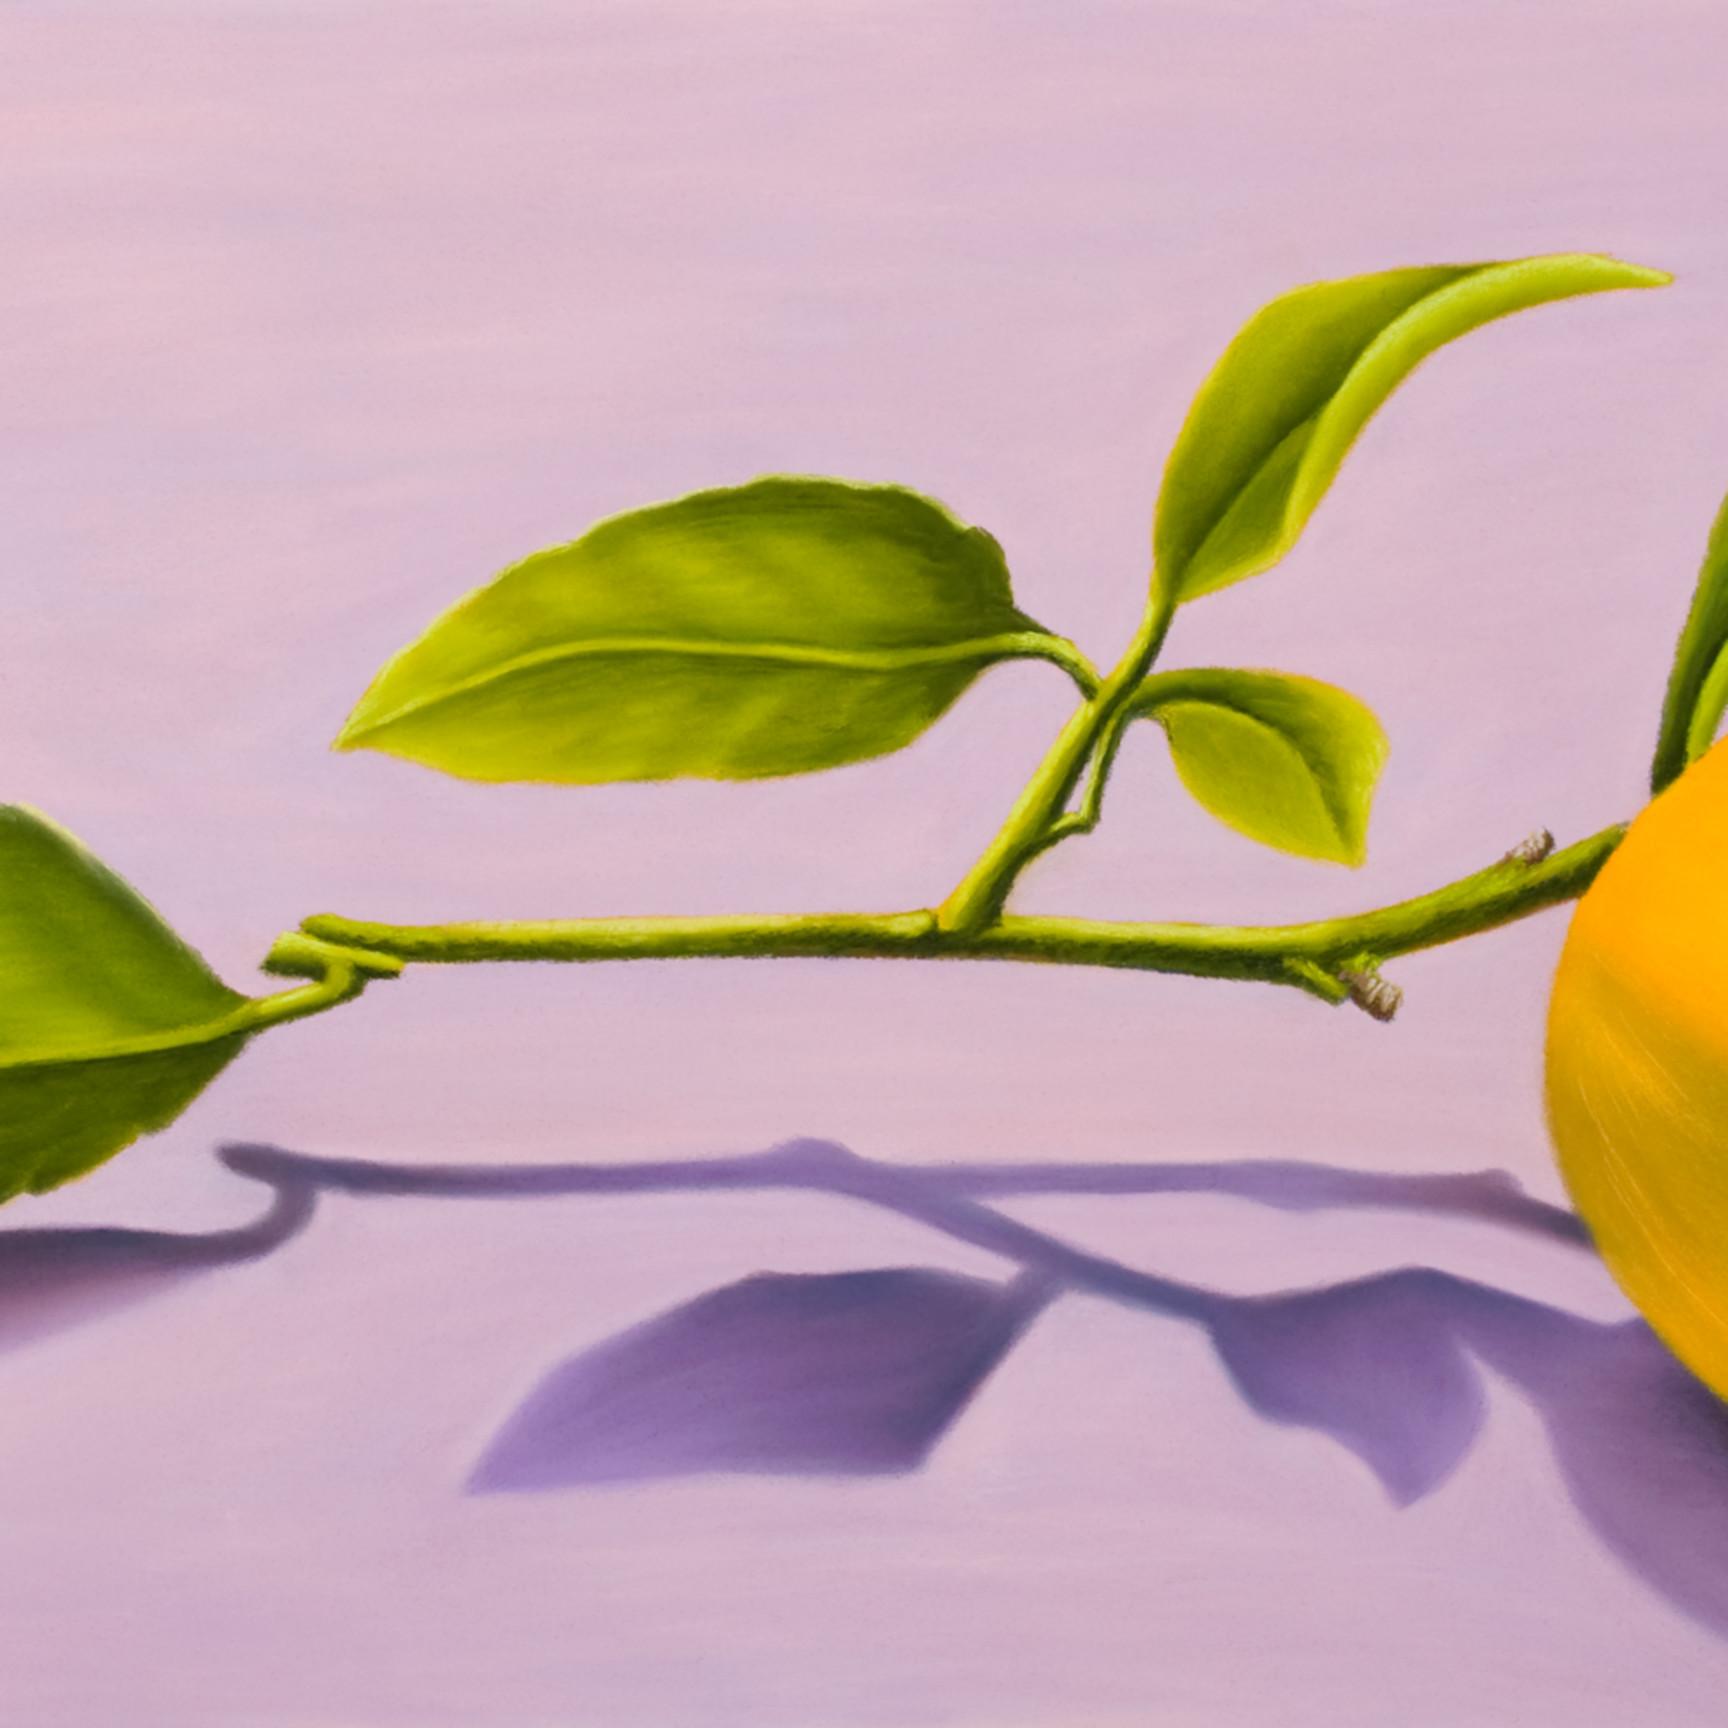 Lemon xtrvvw